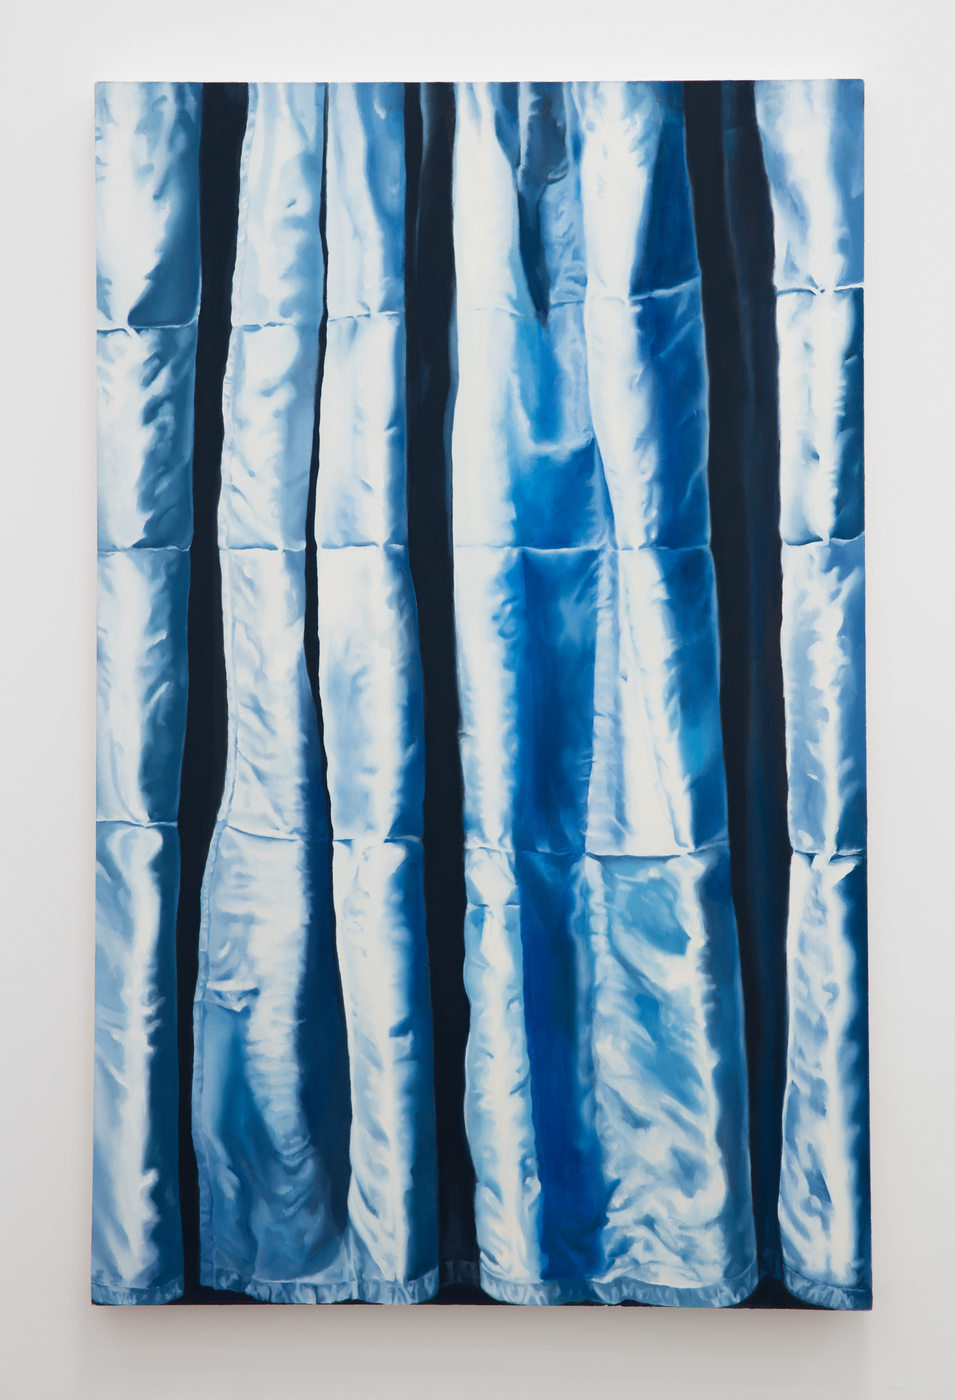 Mika Horibuchi - Curtain Drawn, 2016